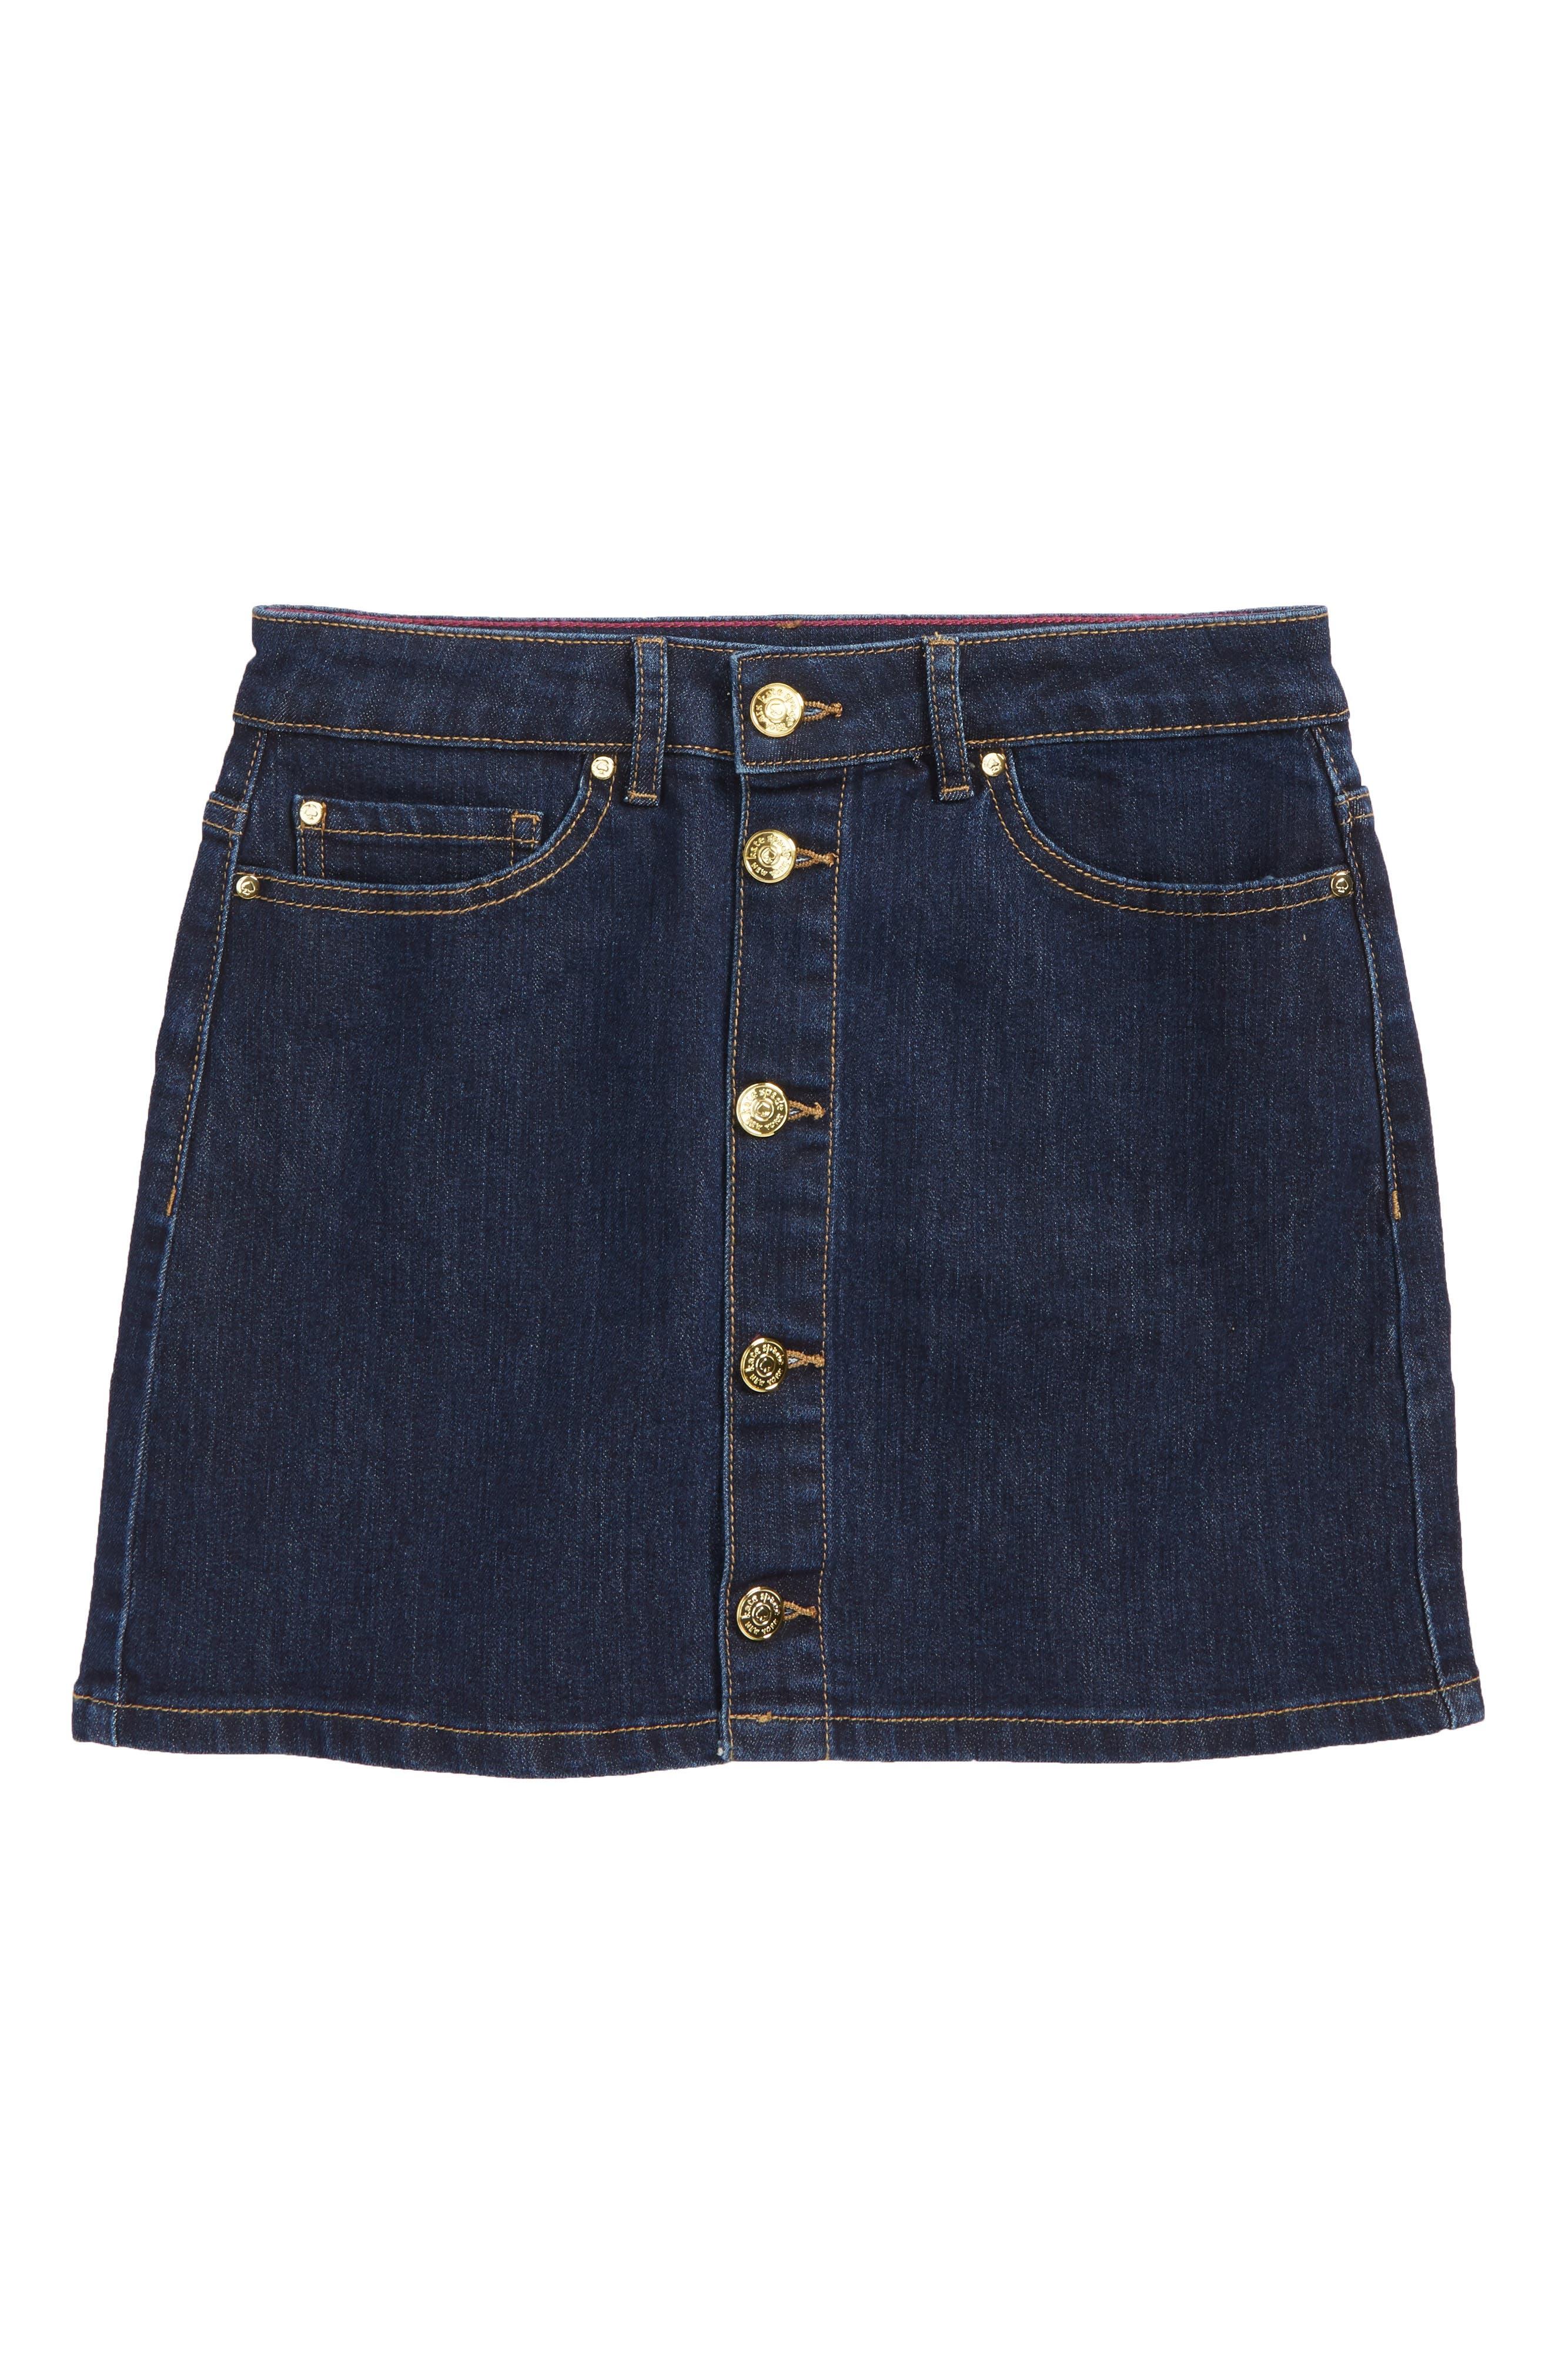 denim skirt,                             Main thumbnail 1, color,                             402